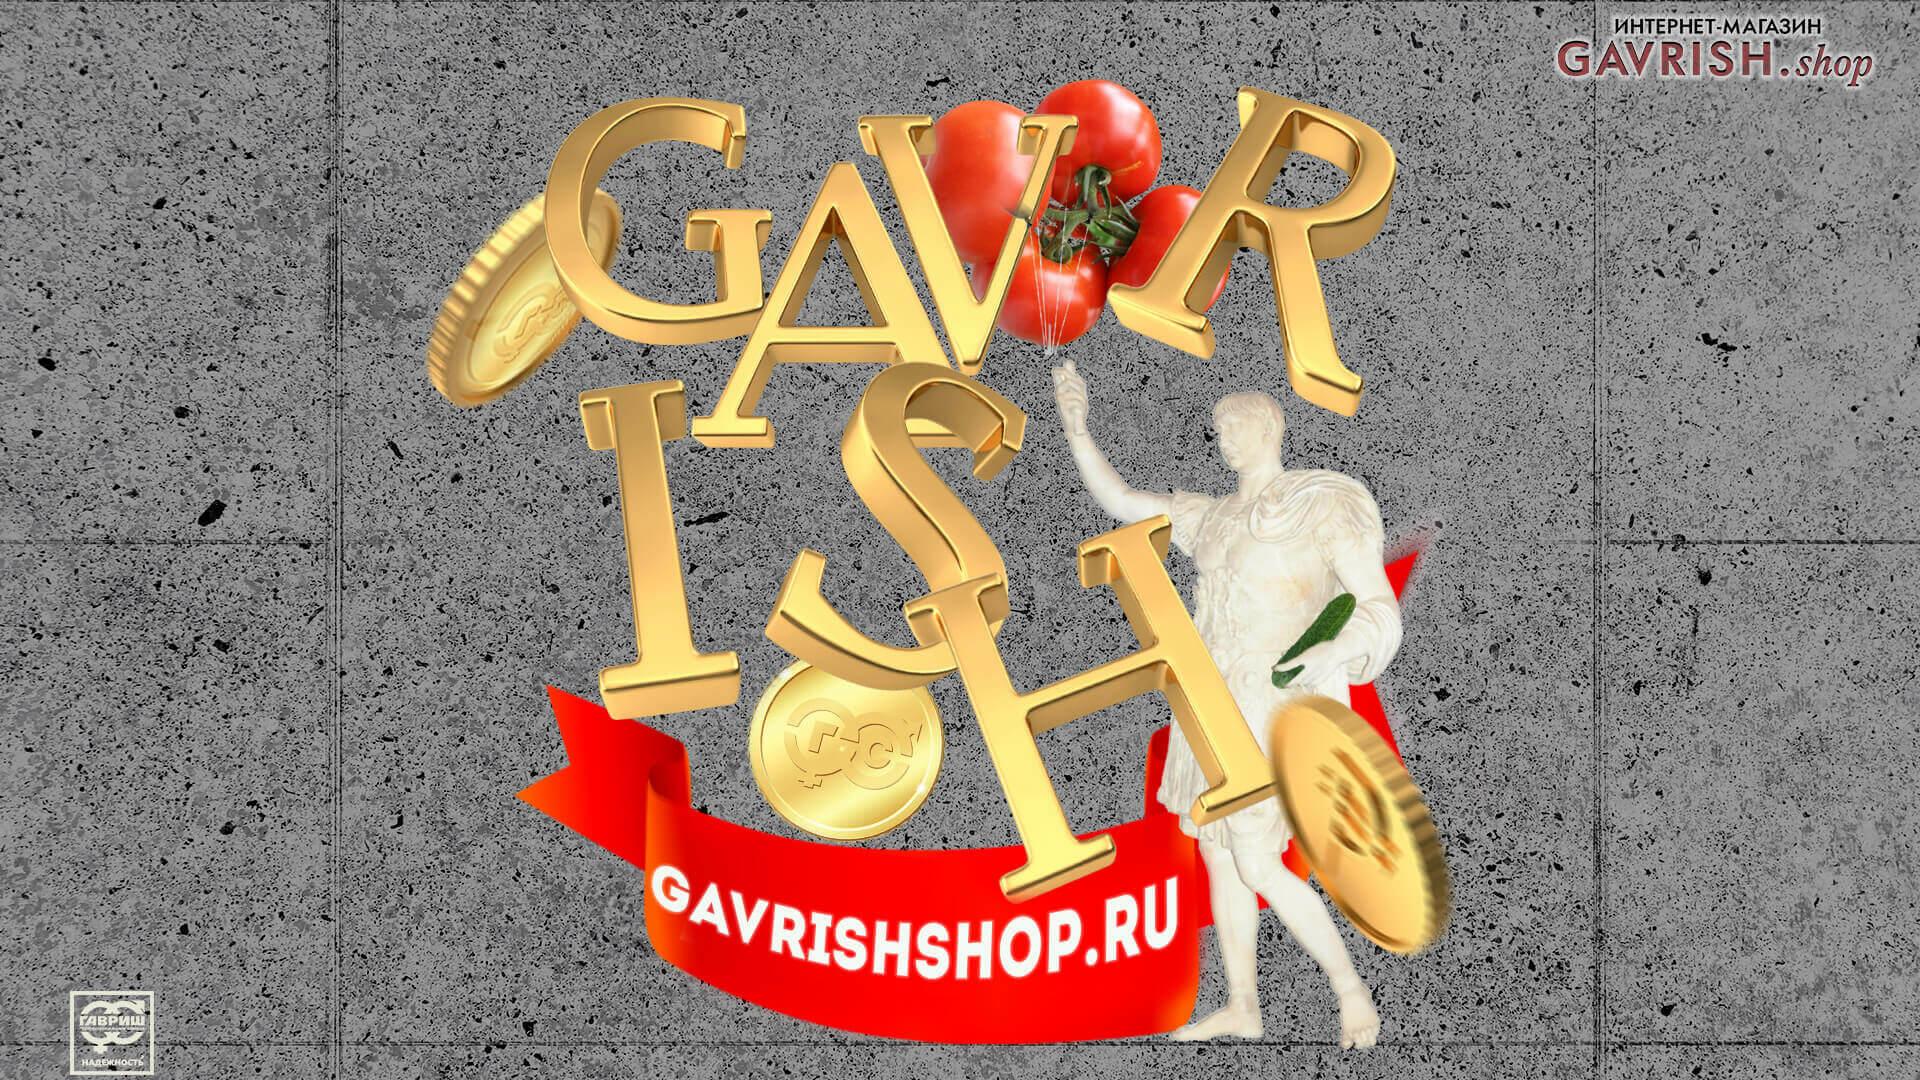 ТЕХНОЛОГИЧЕСКИЙ ДАЙДЖЕСТ ГАВРИШ